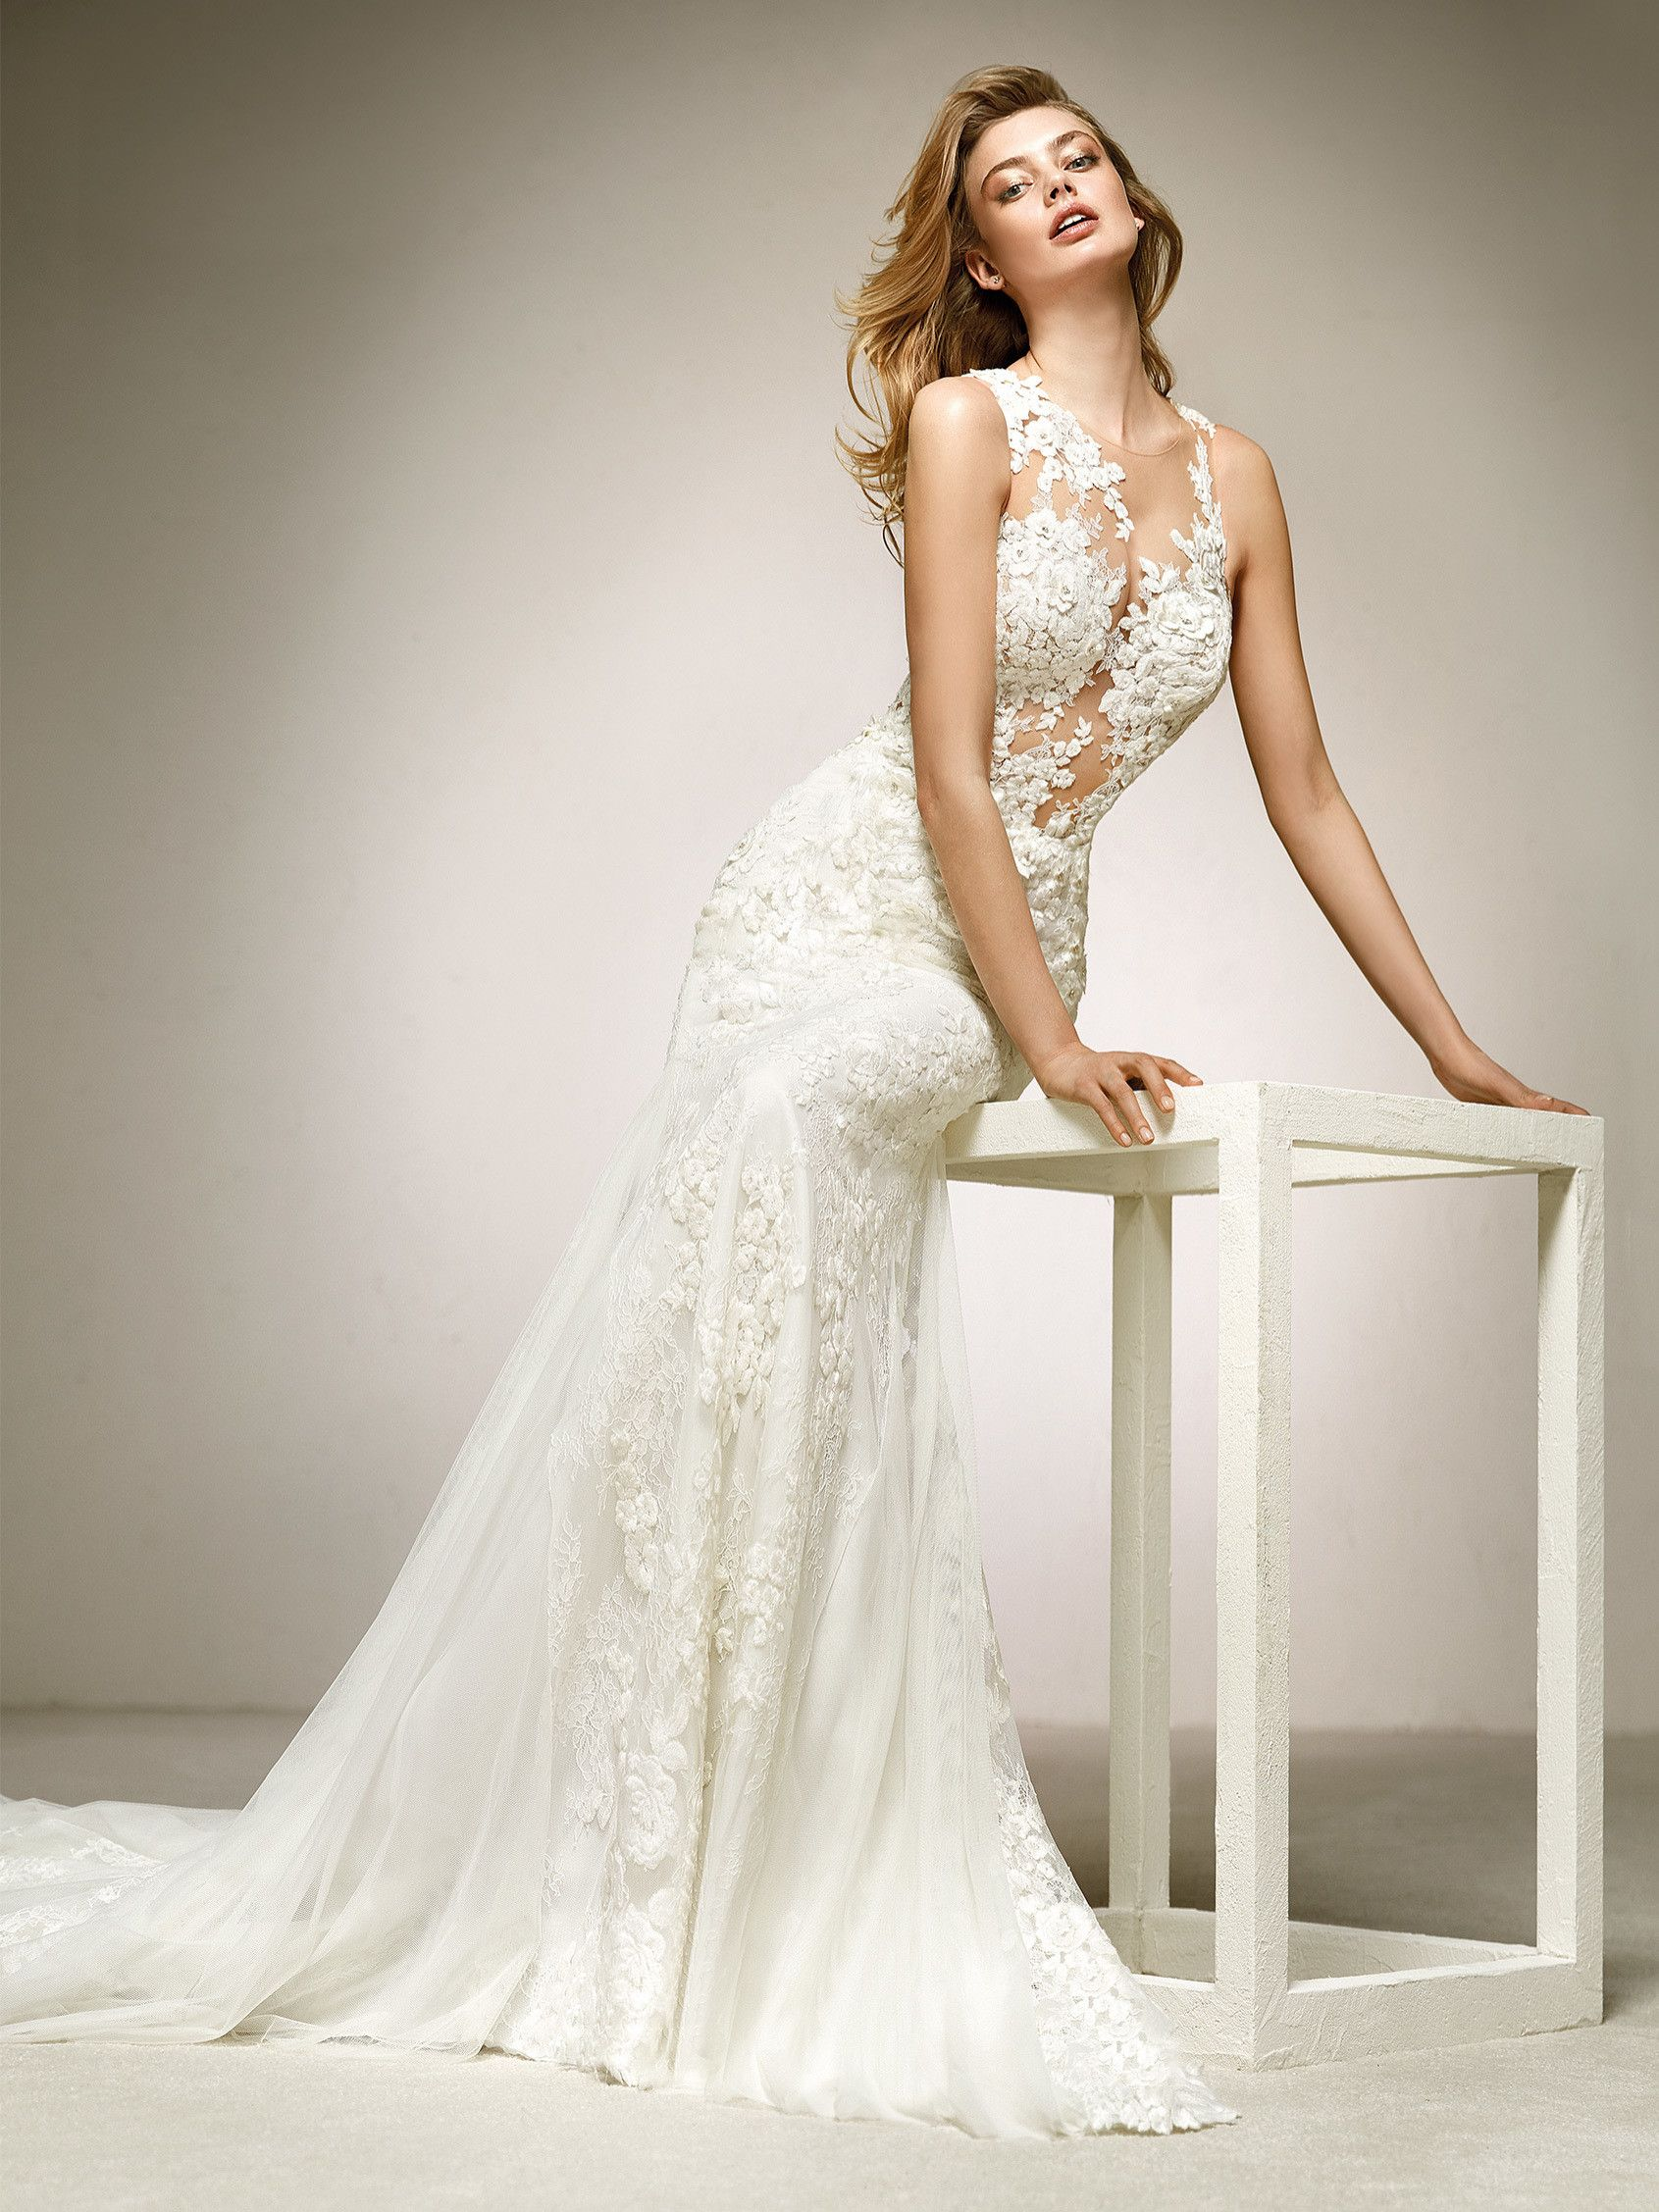 Mermaid wedding dress tattoo effect Wedding Dresses Pinterest